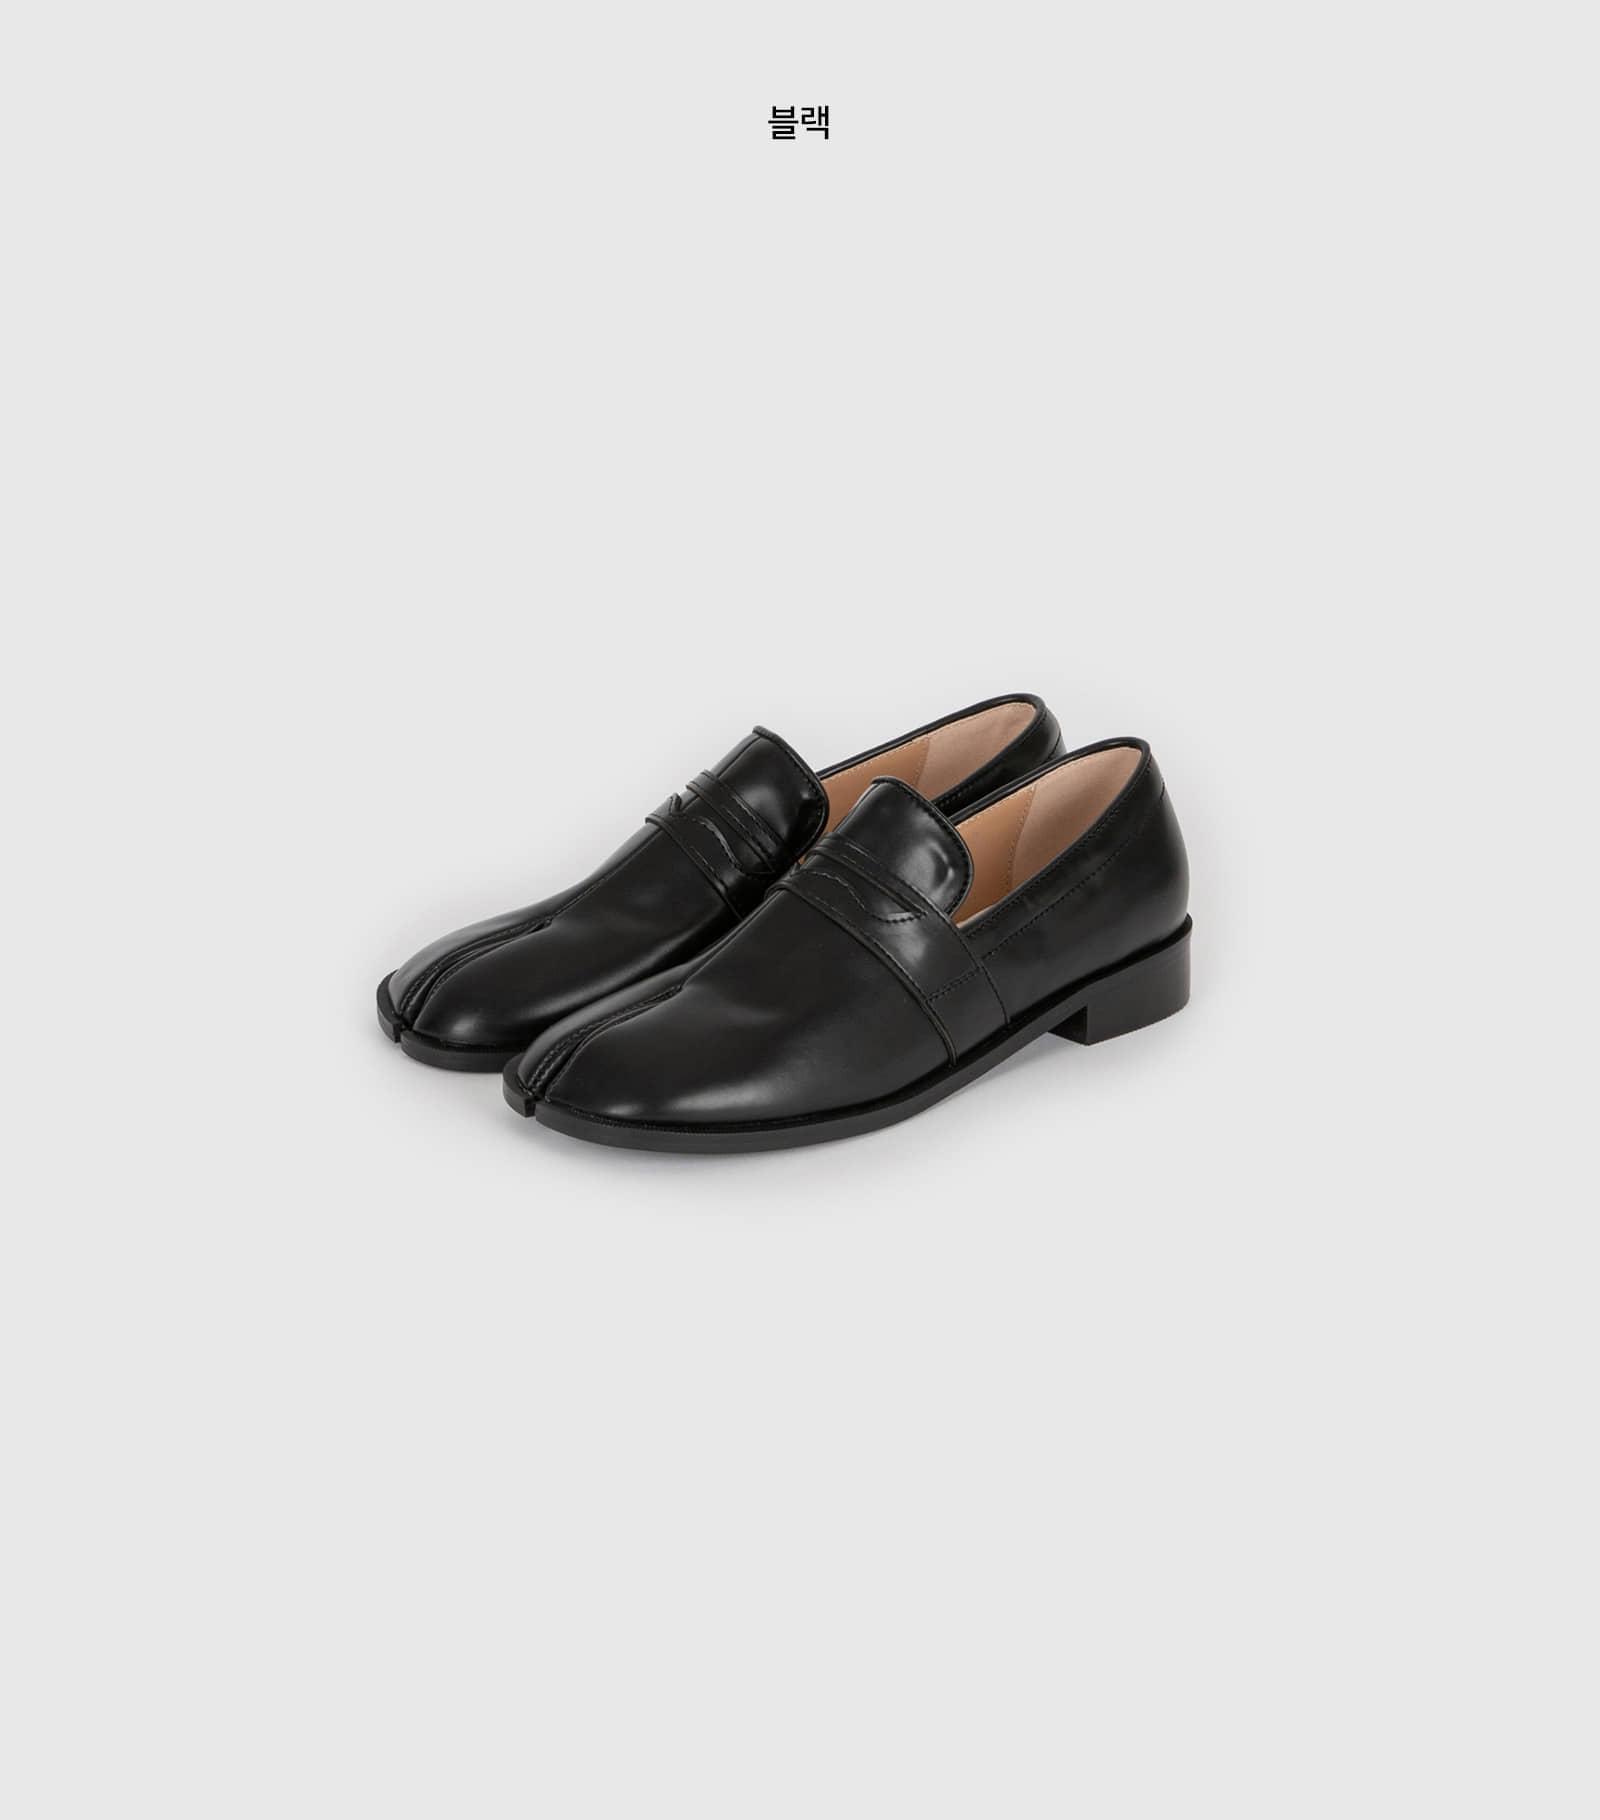 Tabi stitch loafers